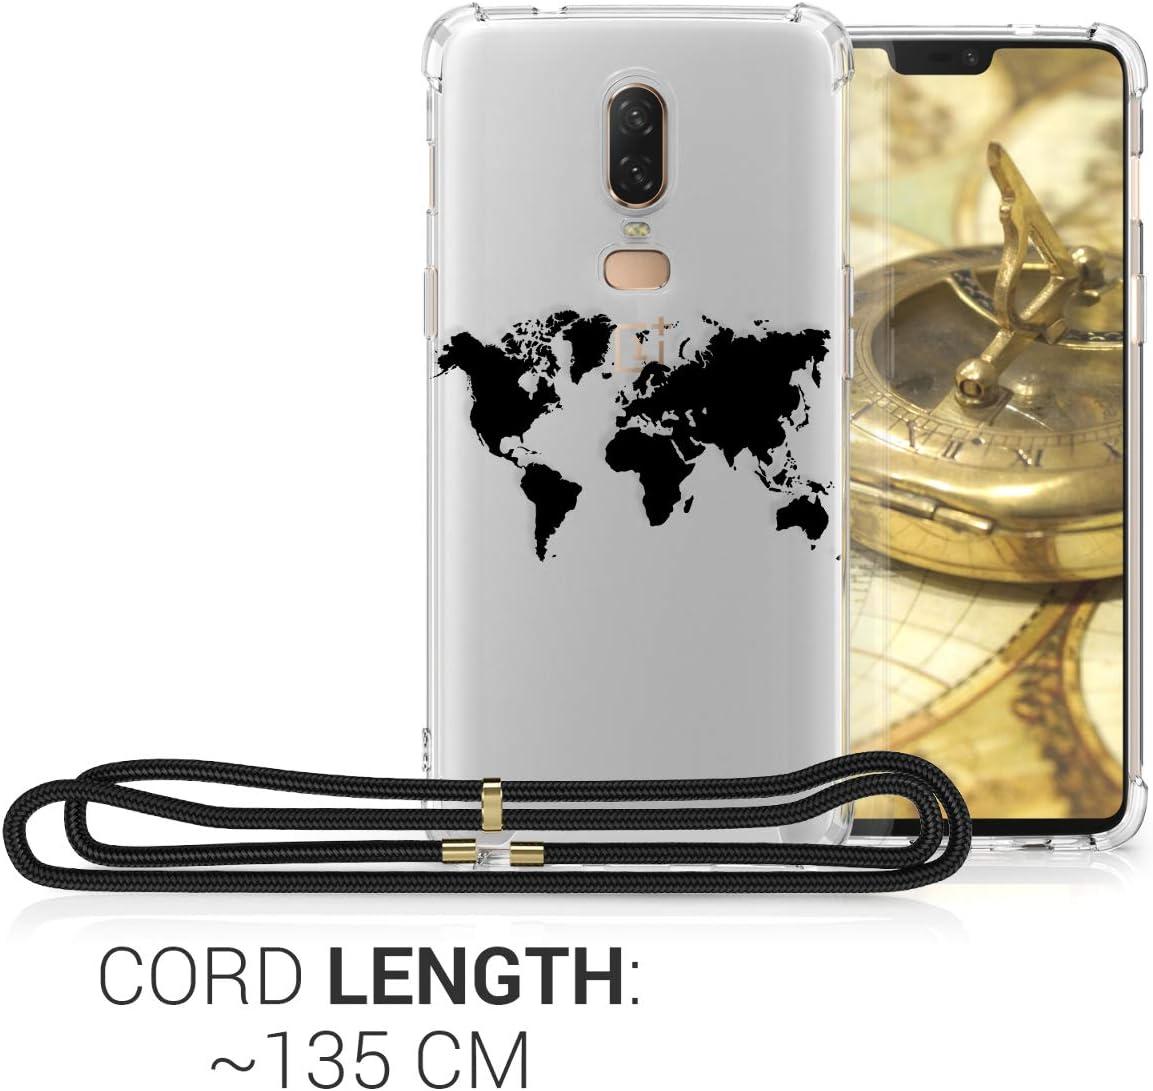 Carcasa de TPU con Colgante Mapa del Mundo Negro//Transparente kwmobile Funda con Cuerda Compatible con OnePlus 6